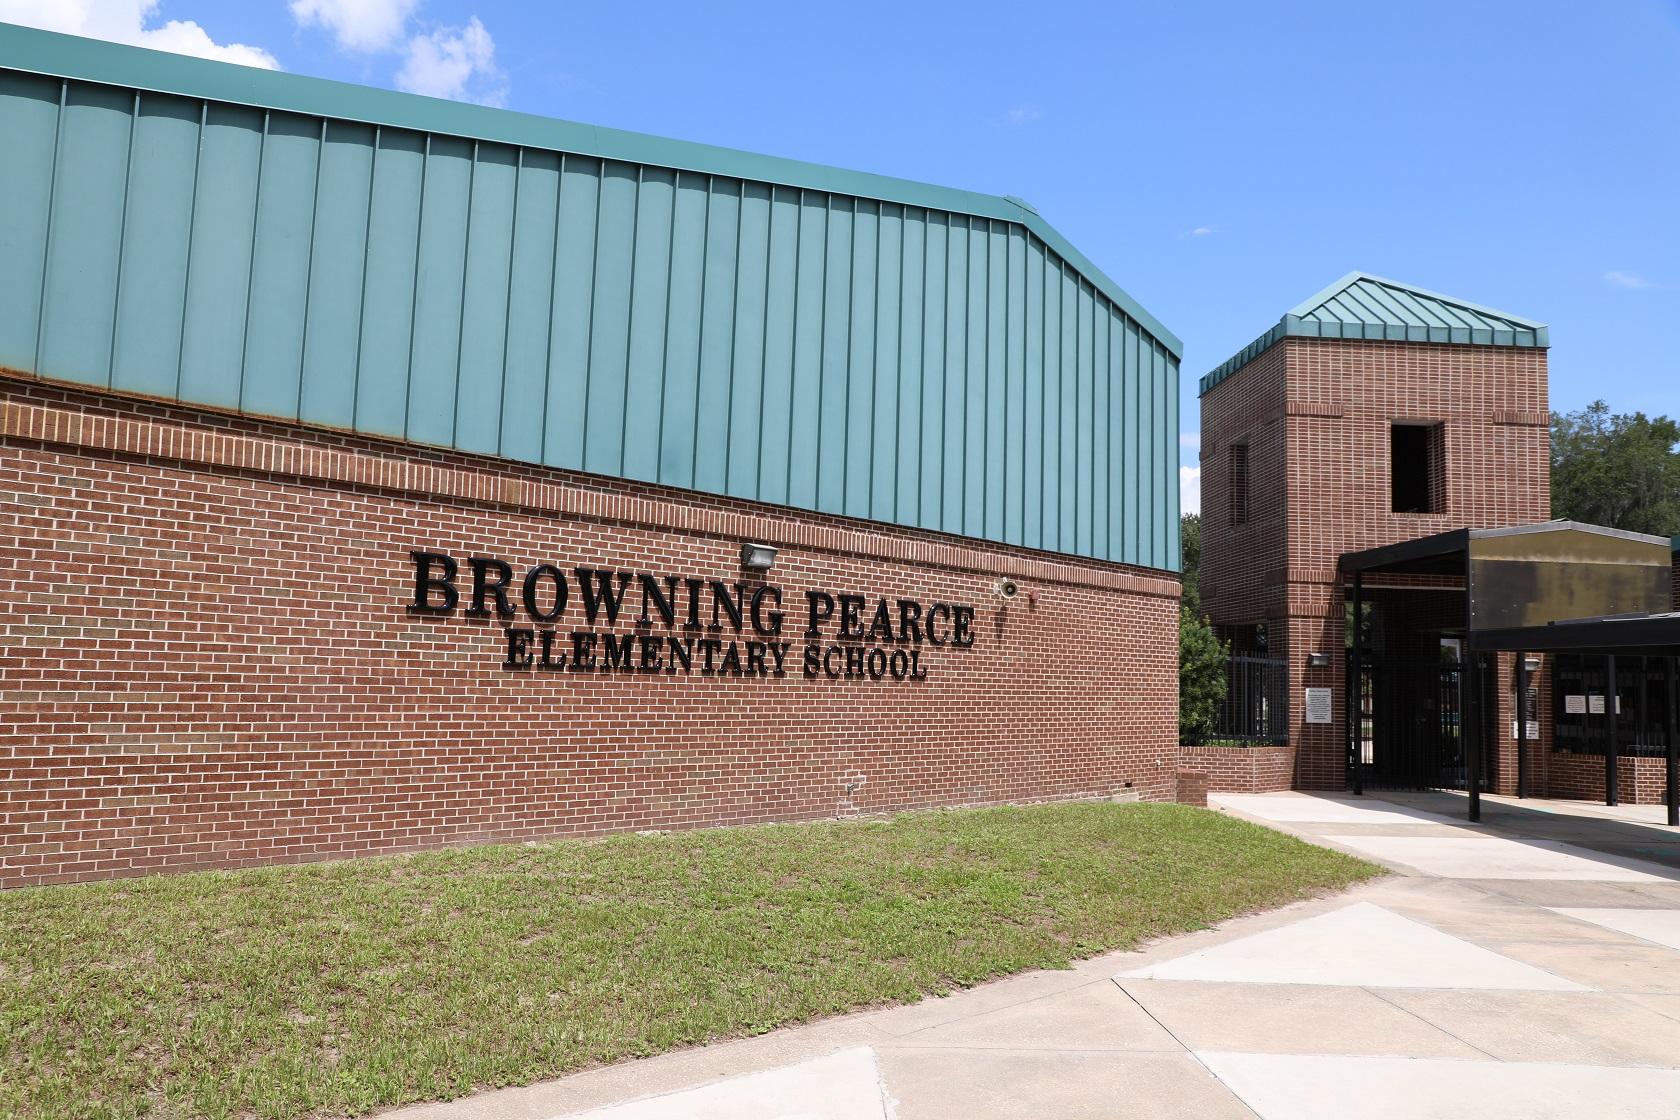 Browning Pearce Elementary School